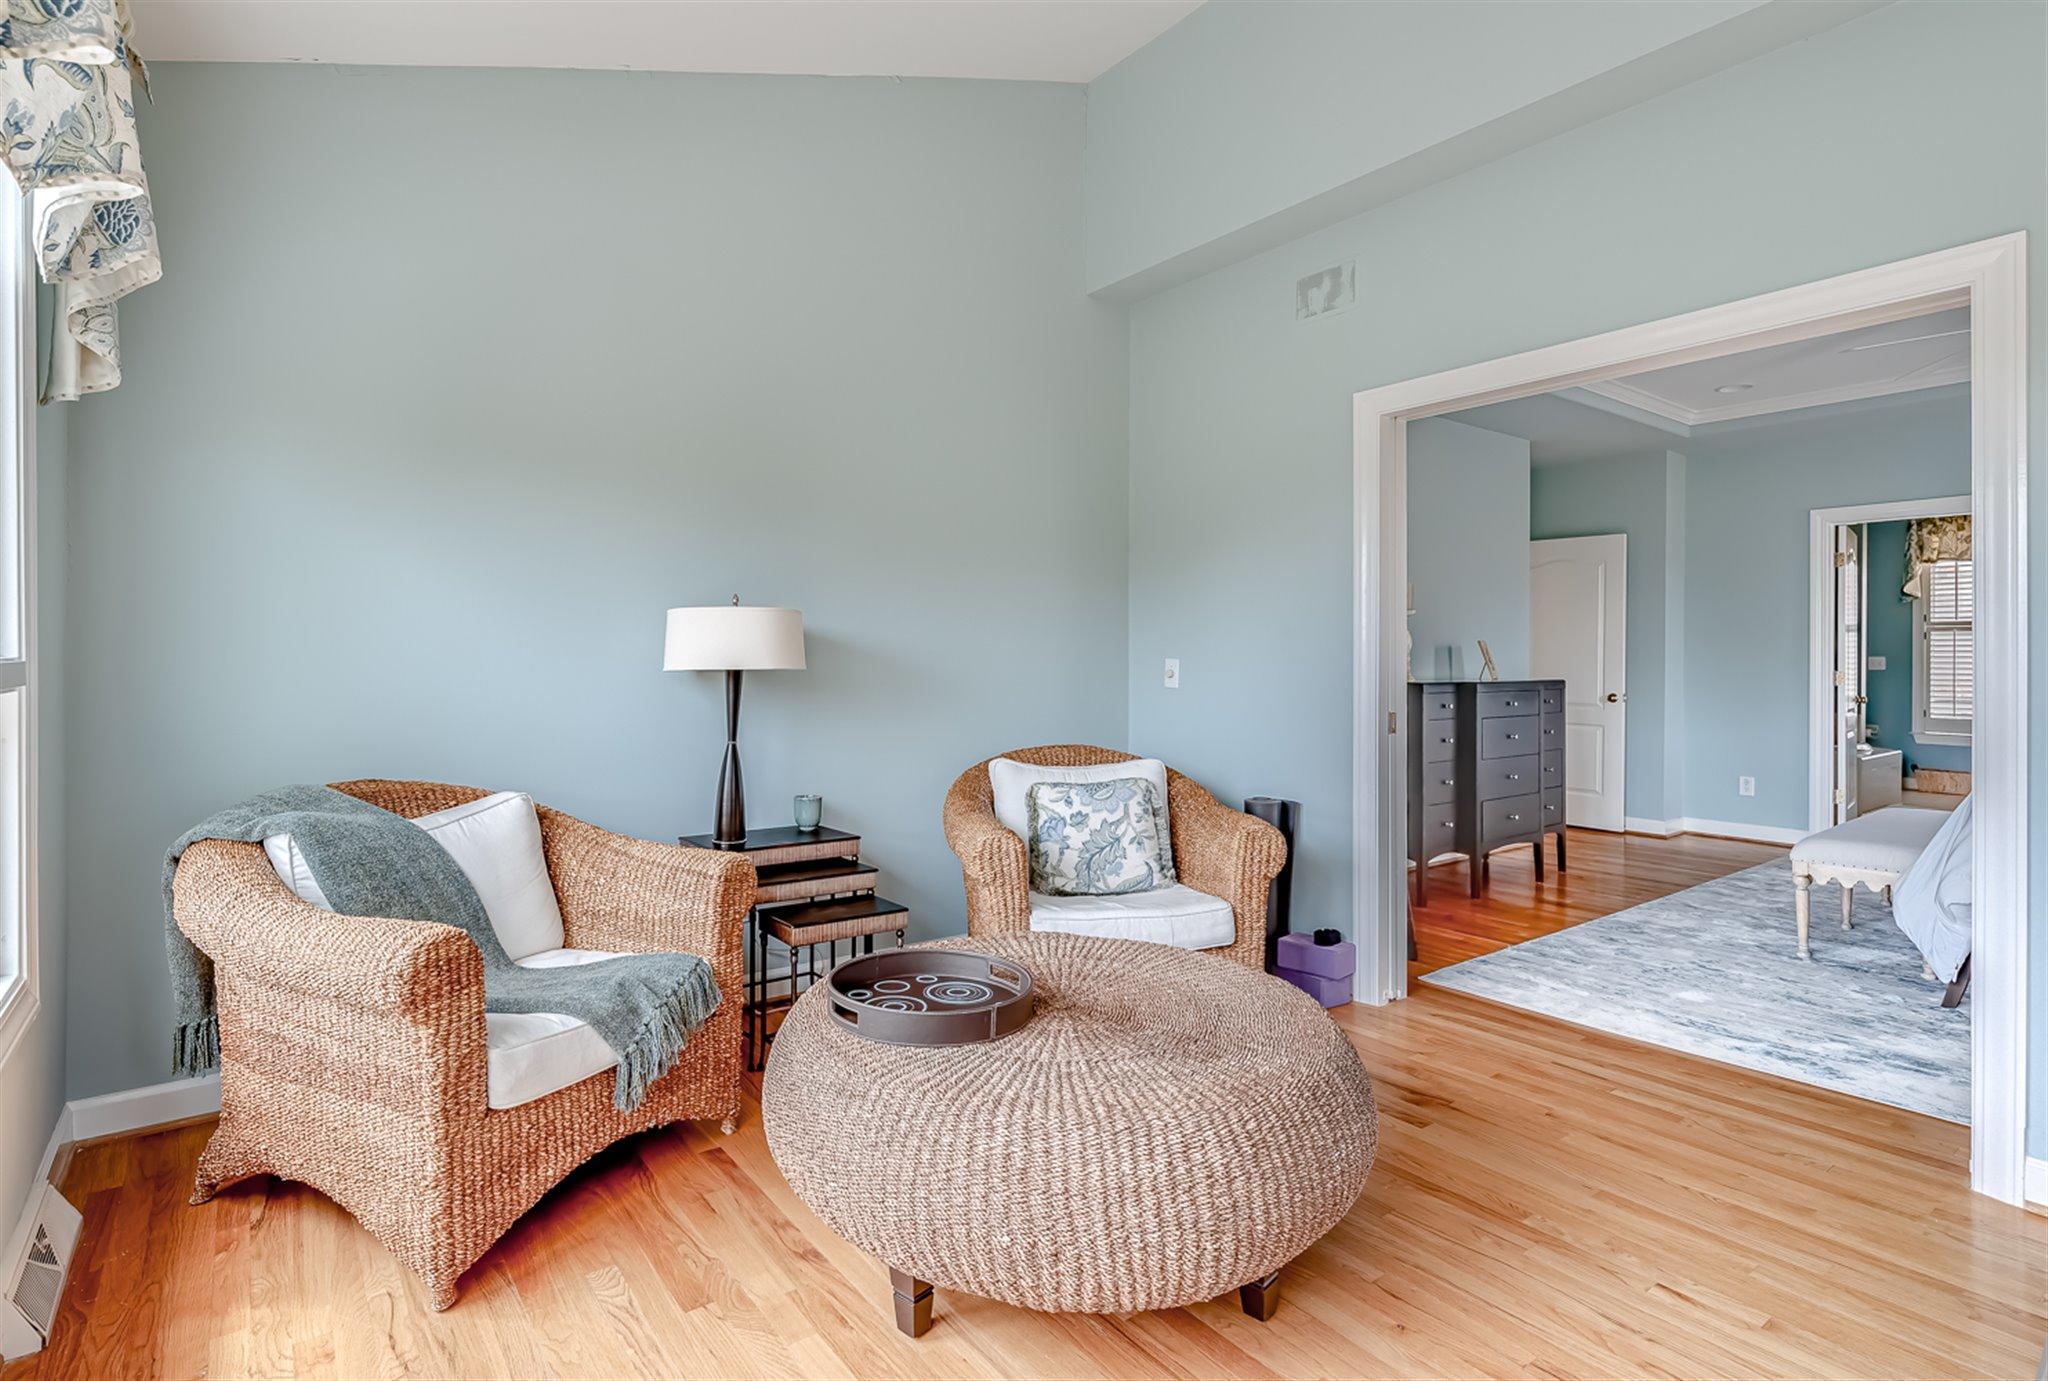 Indigo Point Homes For Sale - 50 Indigo Point, Charleston, SC - 28